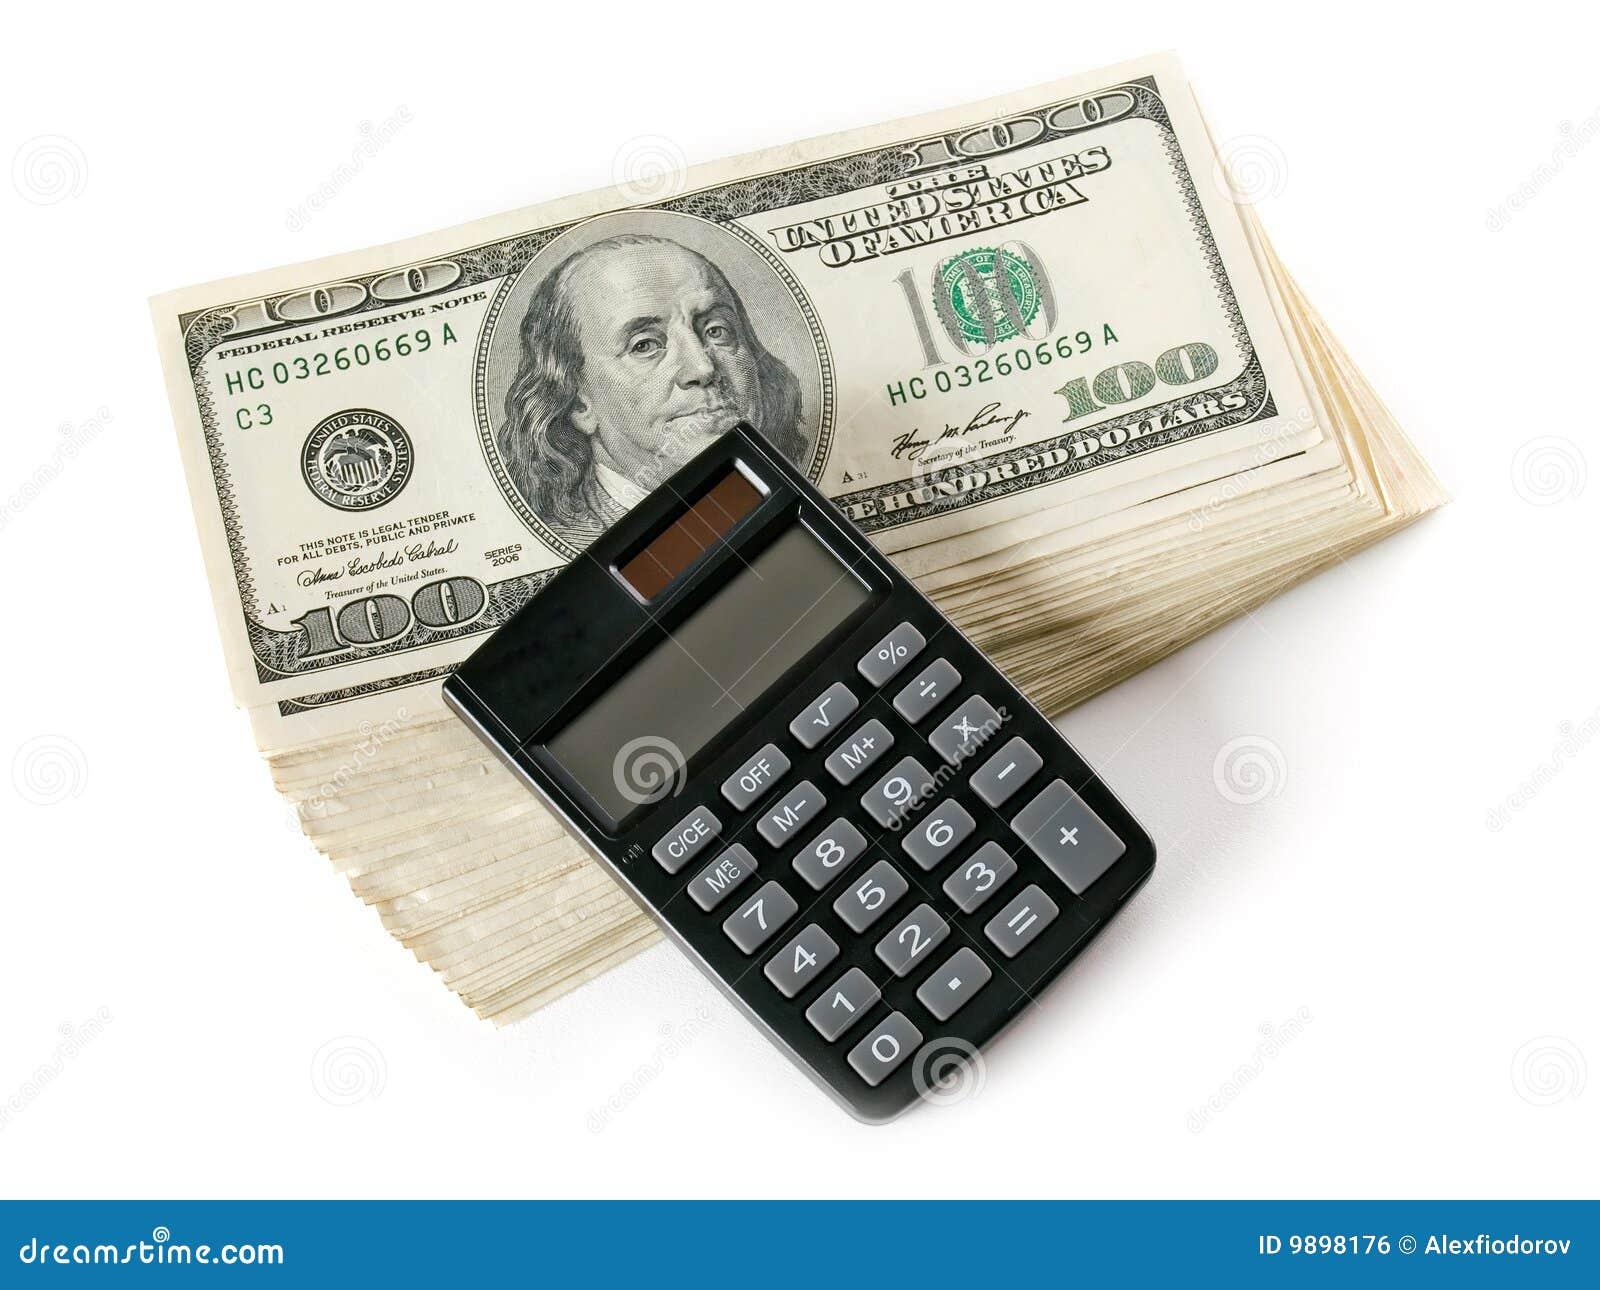 money market calculator free